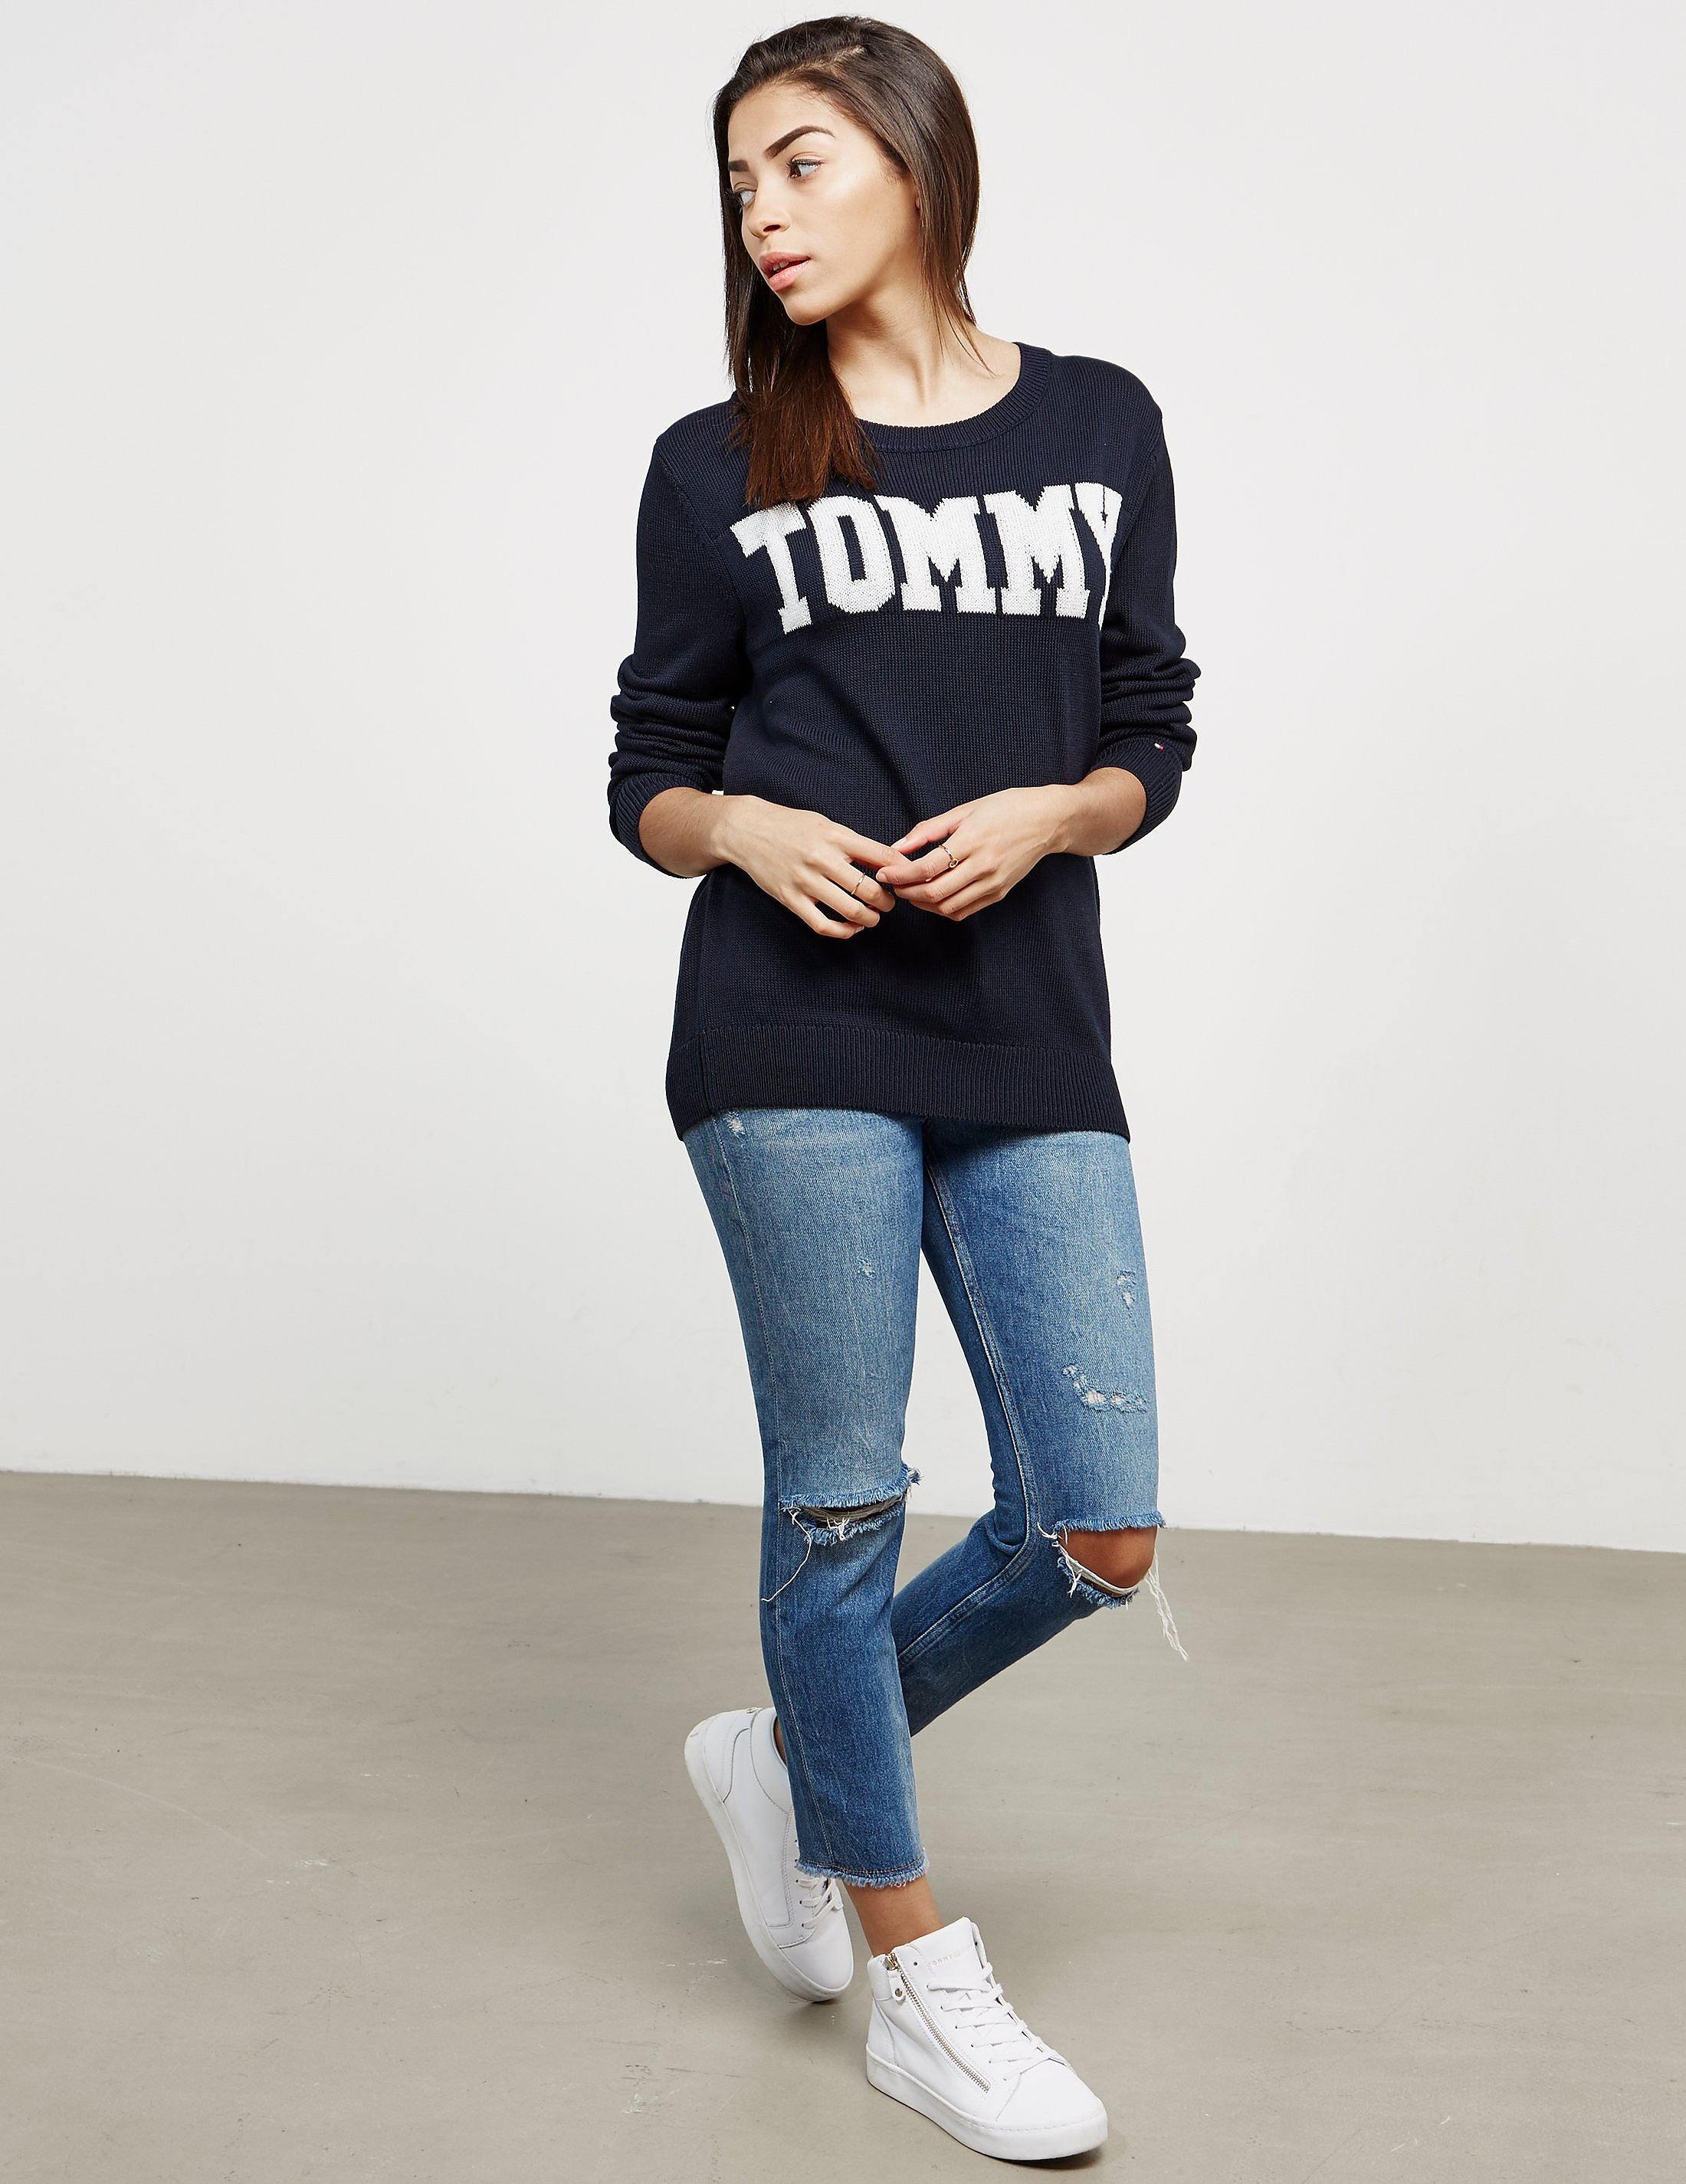 Tommy Hilfiger Rachel Tommy Knit Jumper